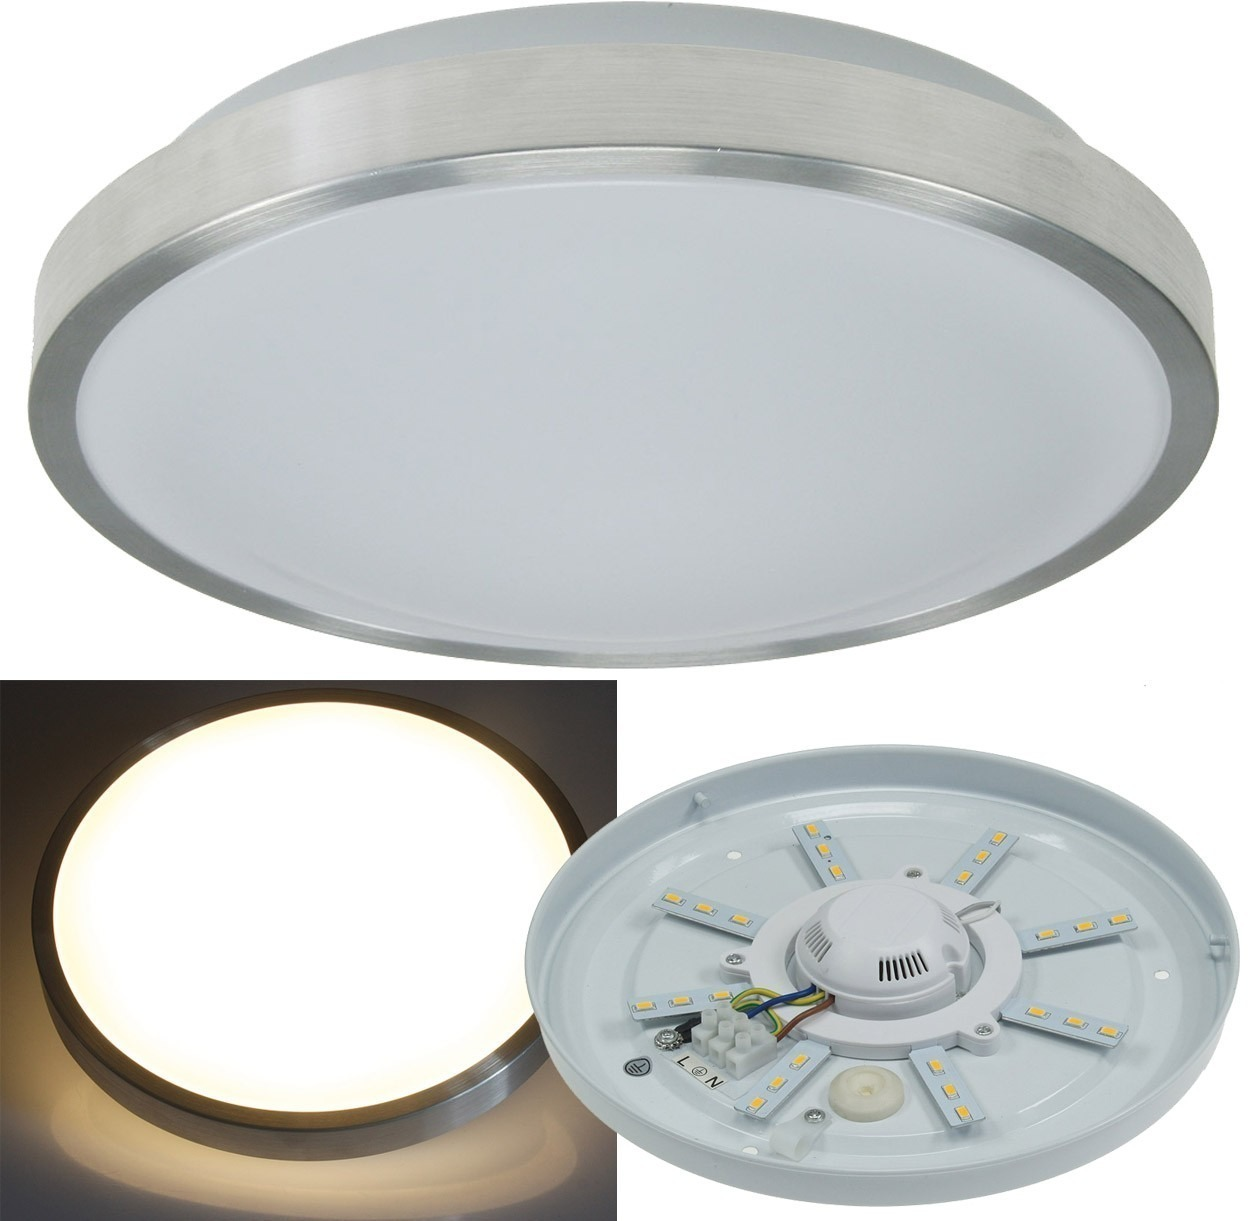 LED Deckenleuchte Acronica 12w 700lm